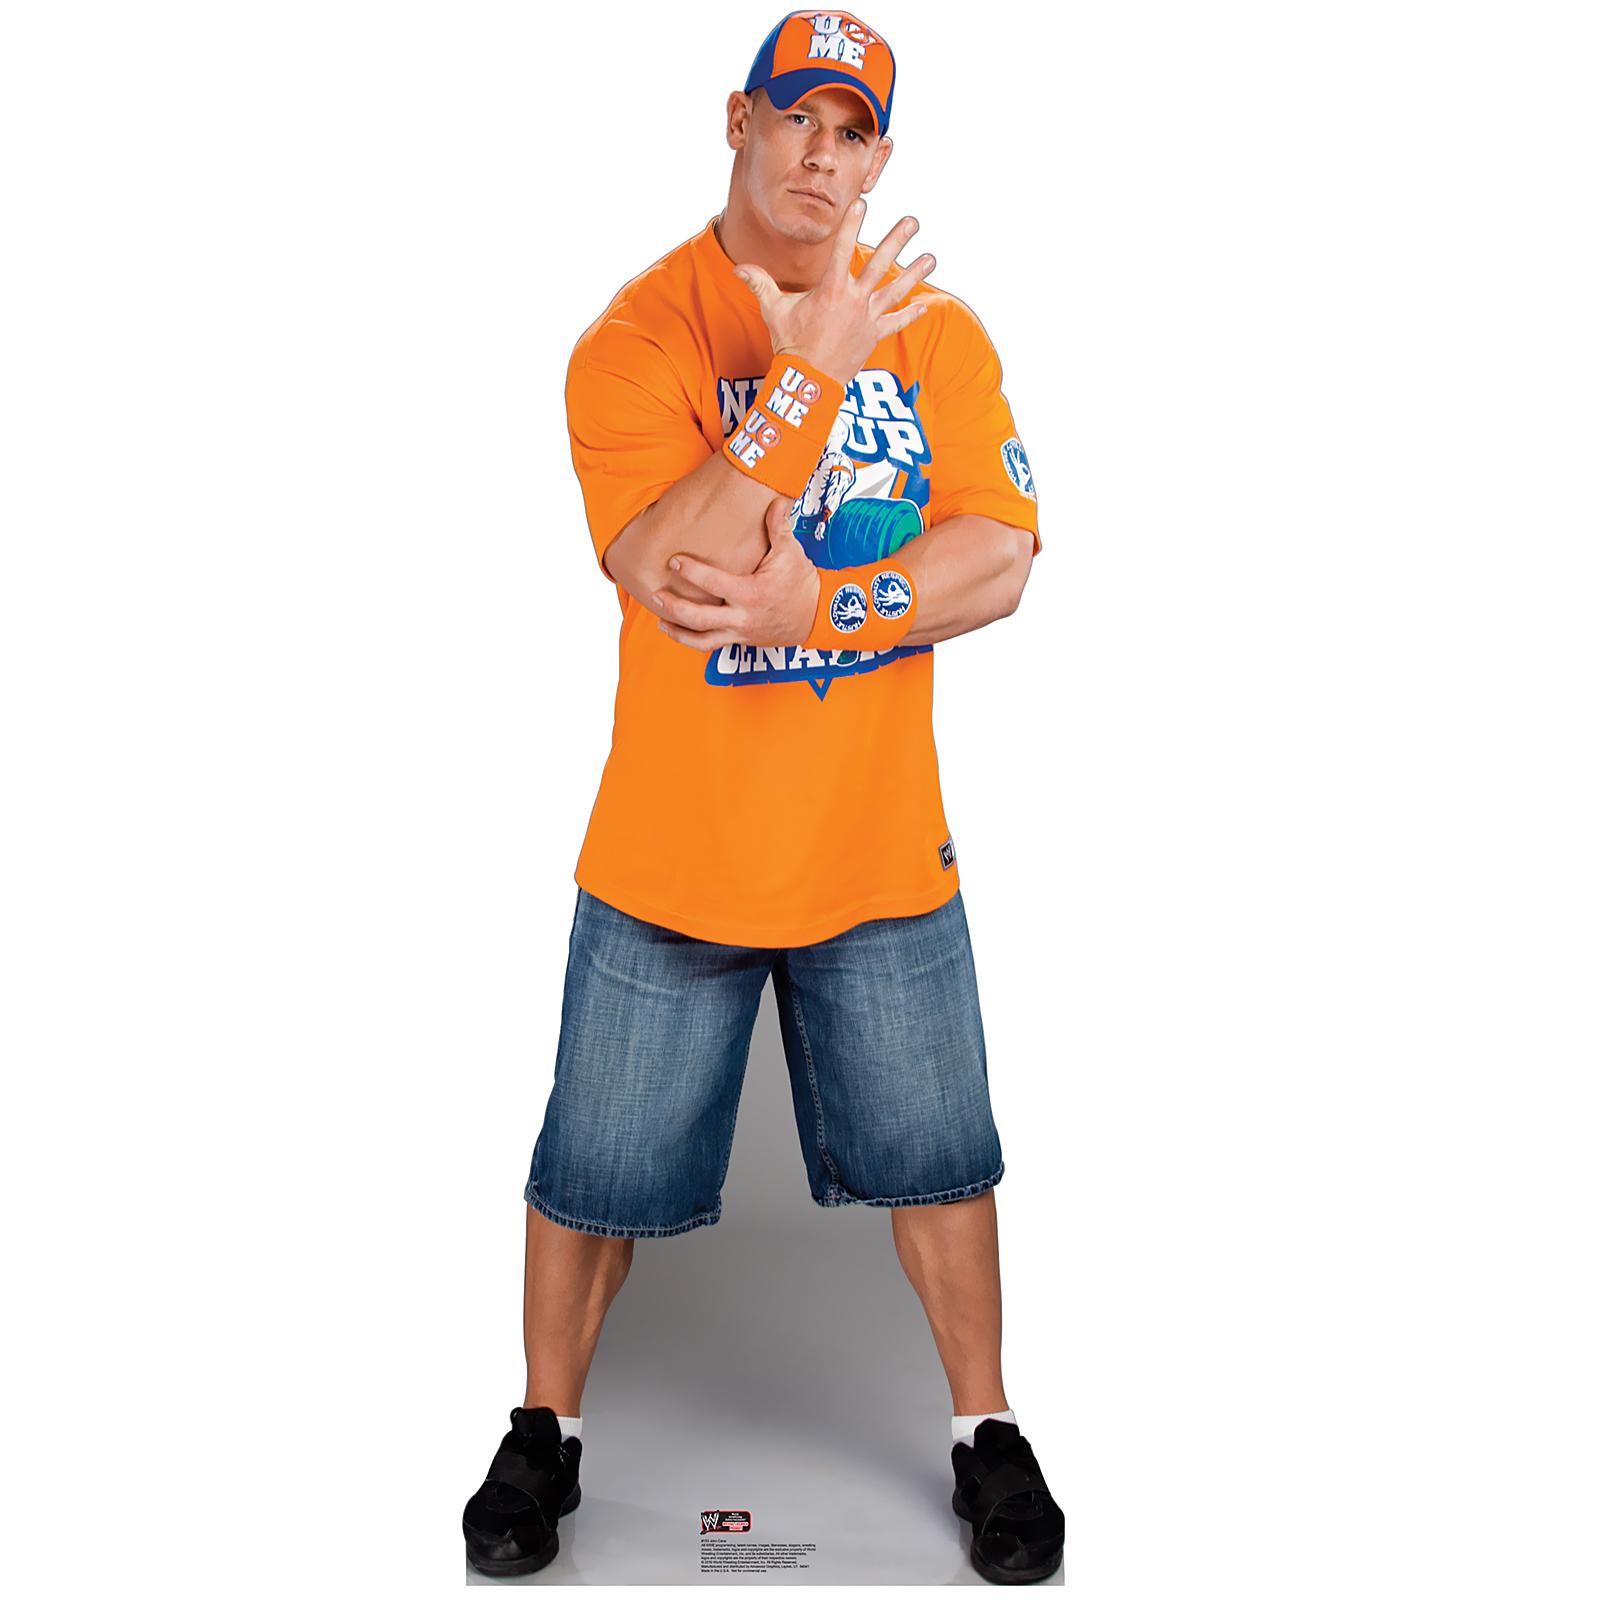 John Cena WWE Standup 6 Tall BirthdayExpresscom